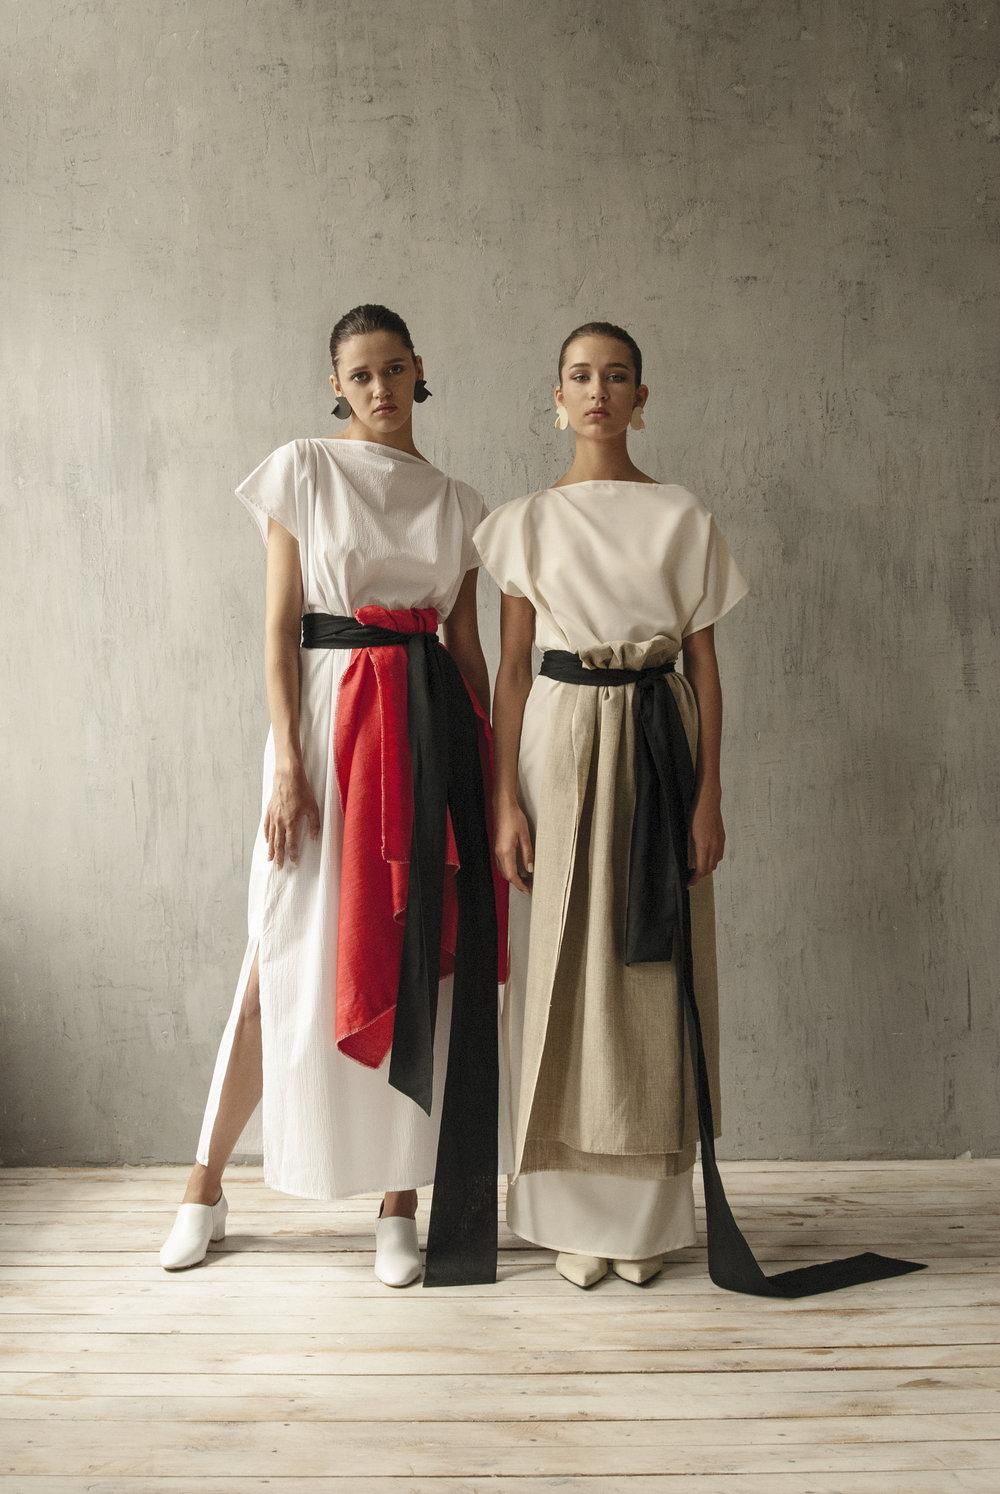 km-by-lange-zapaska-motanka-black-belt-dress-gown-0001.jpg